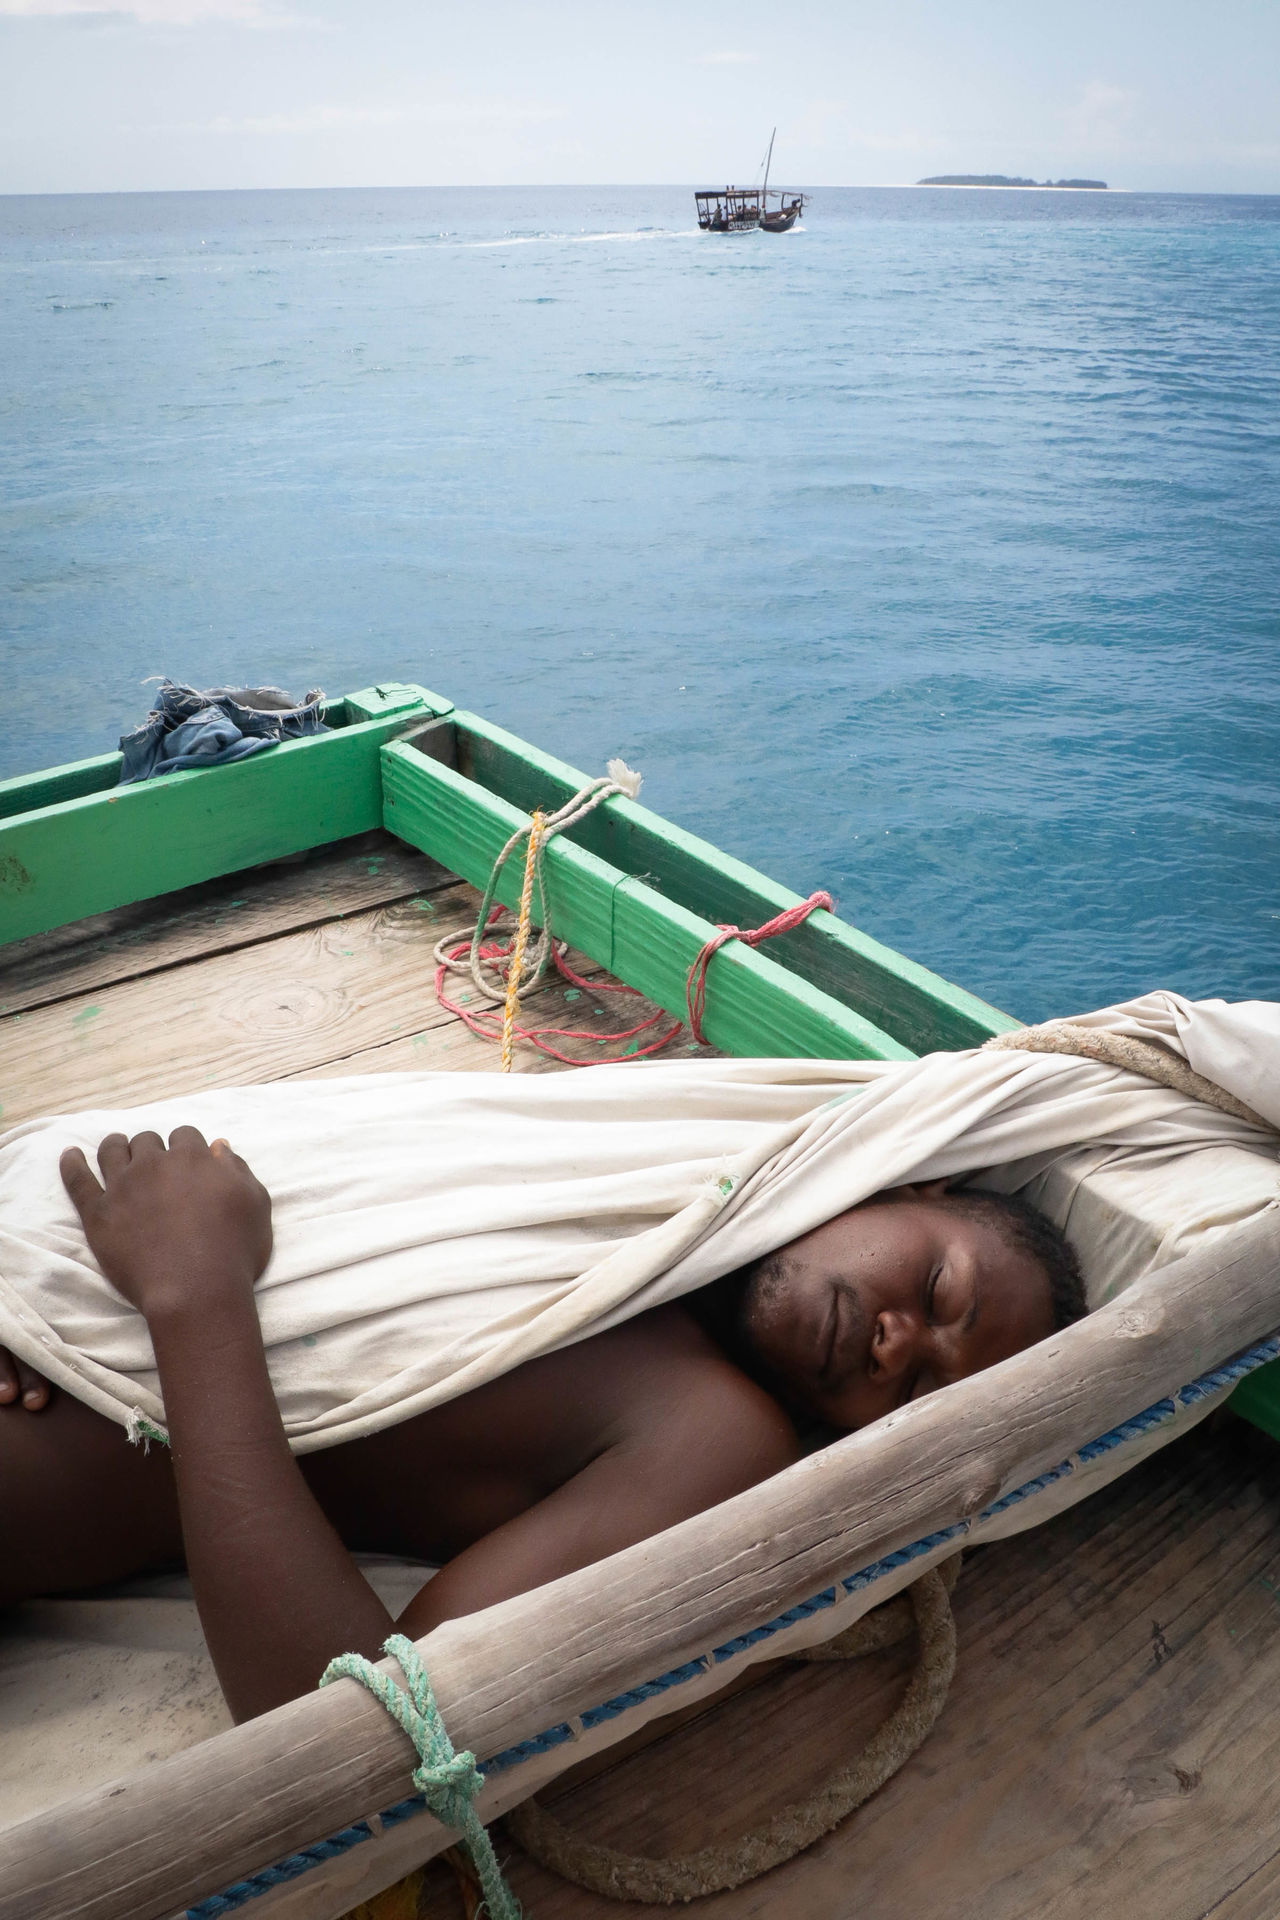 Naked man with blanket sleeping on pier in sea